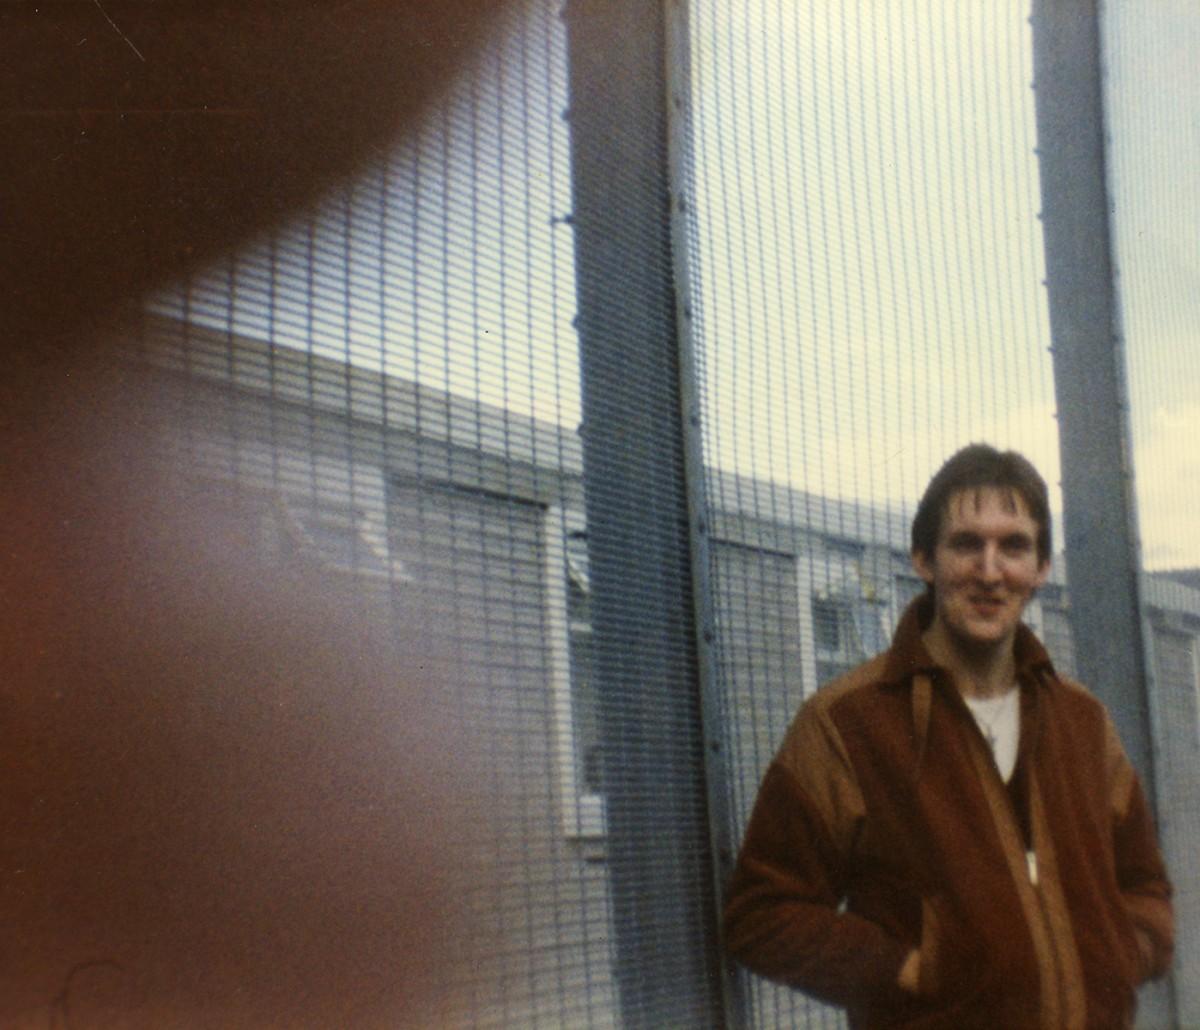 McKeown // County Antrim :: Laurence McKeown in H-Block exercise yard